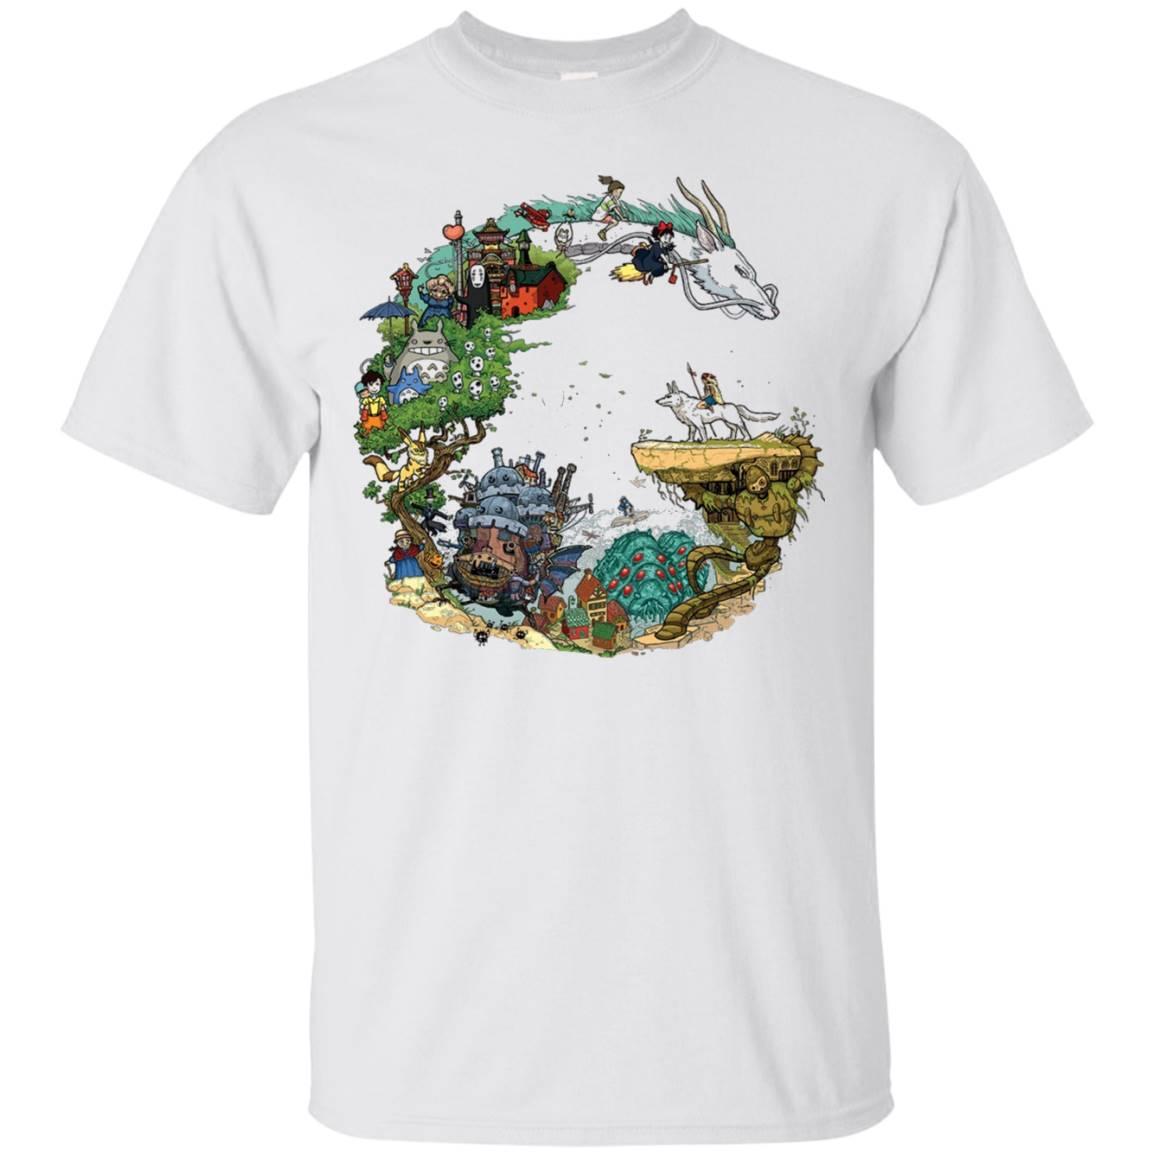 Totoro t-shirt – Studio Ghibli – Totoro T-Shirt